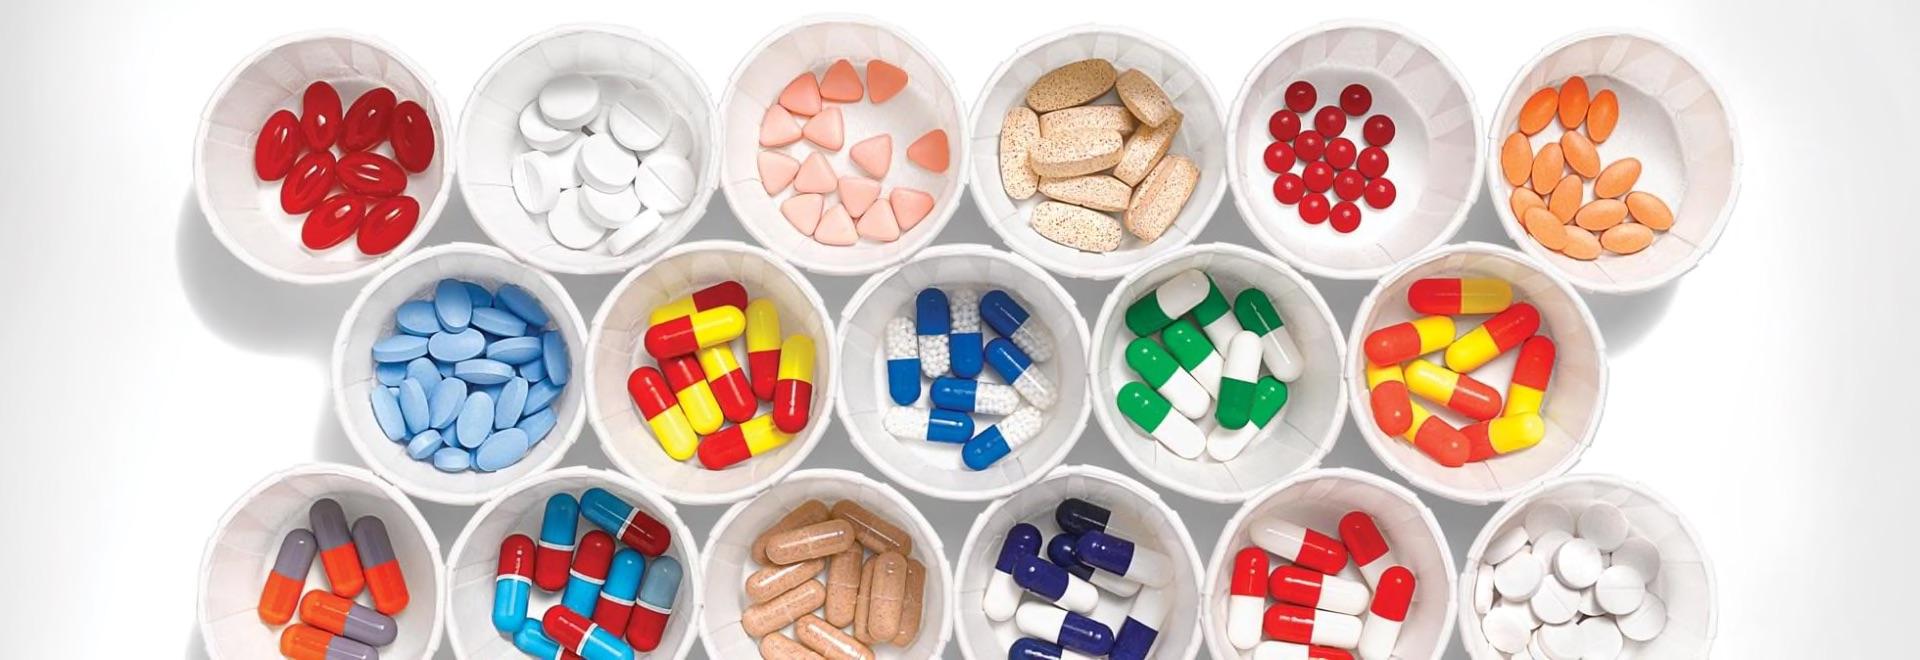 Pharmacogenomics genetic testing and analysis